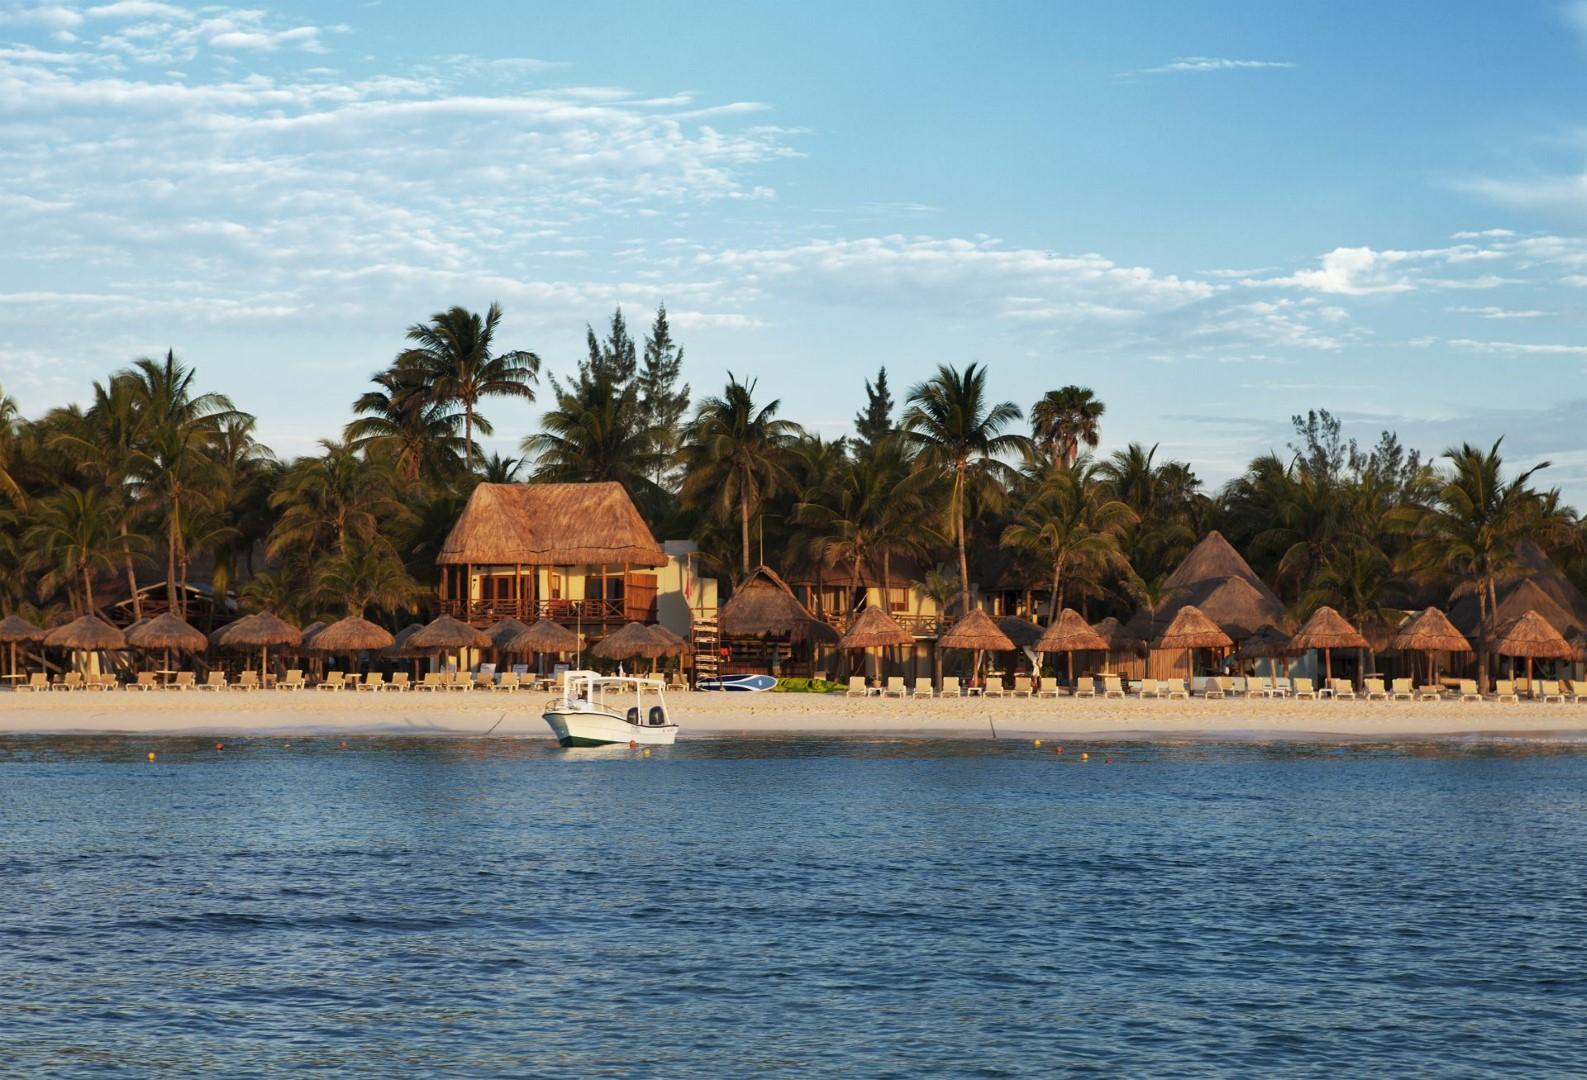 View of beach from sea at Mahekal Beach Resort